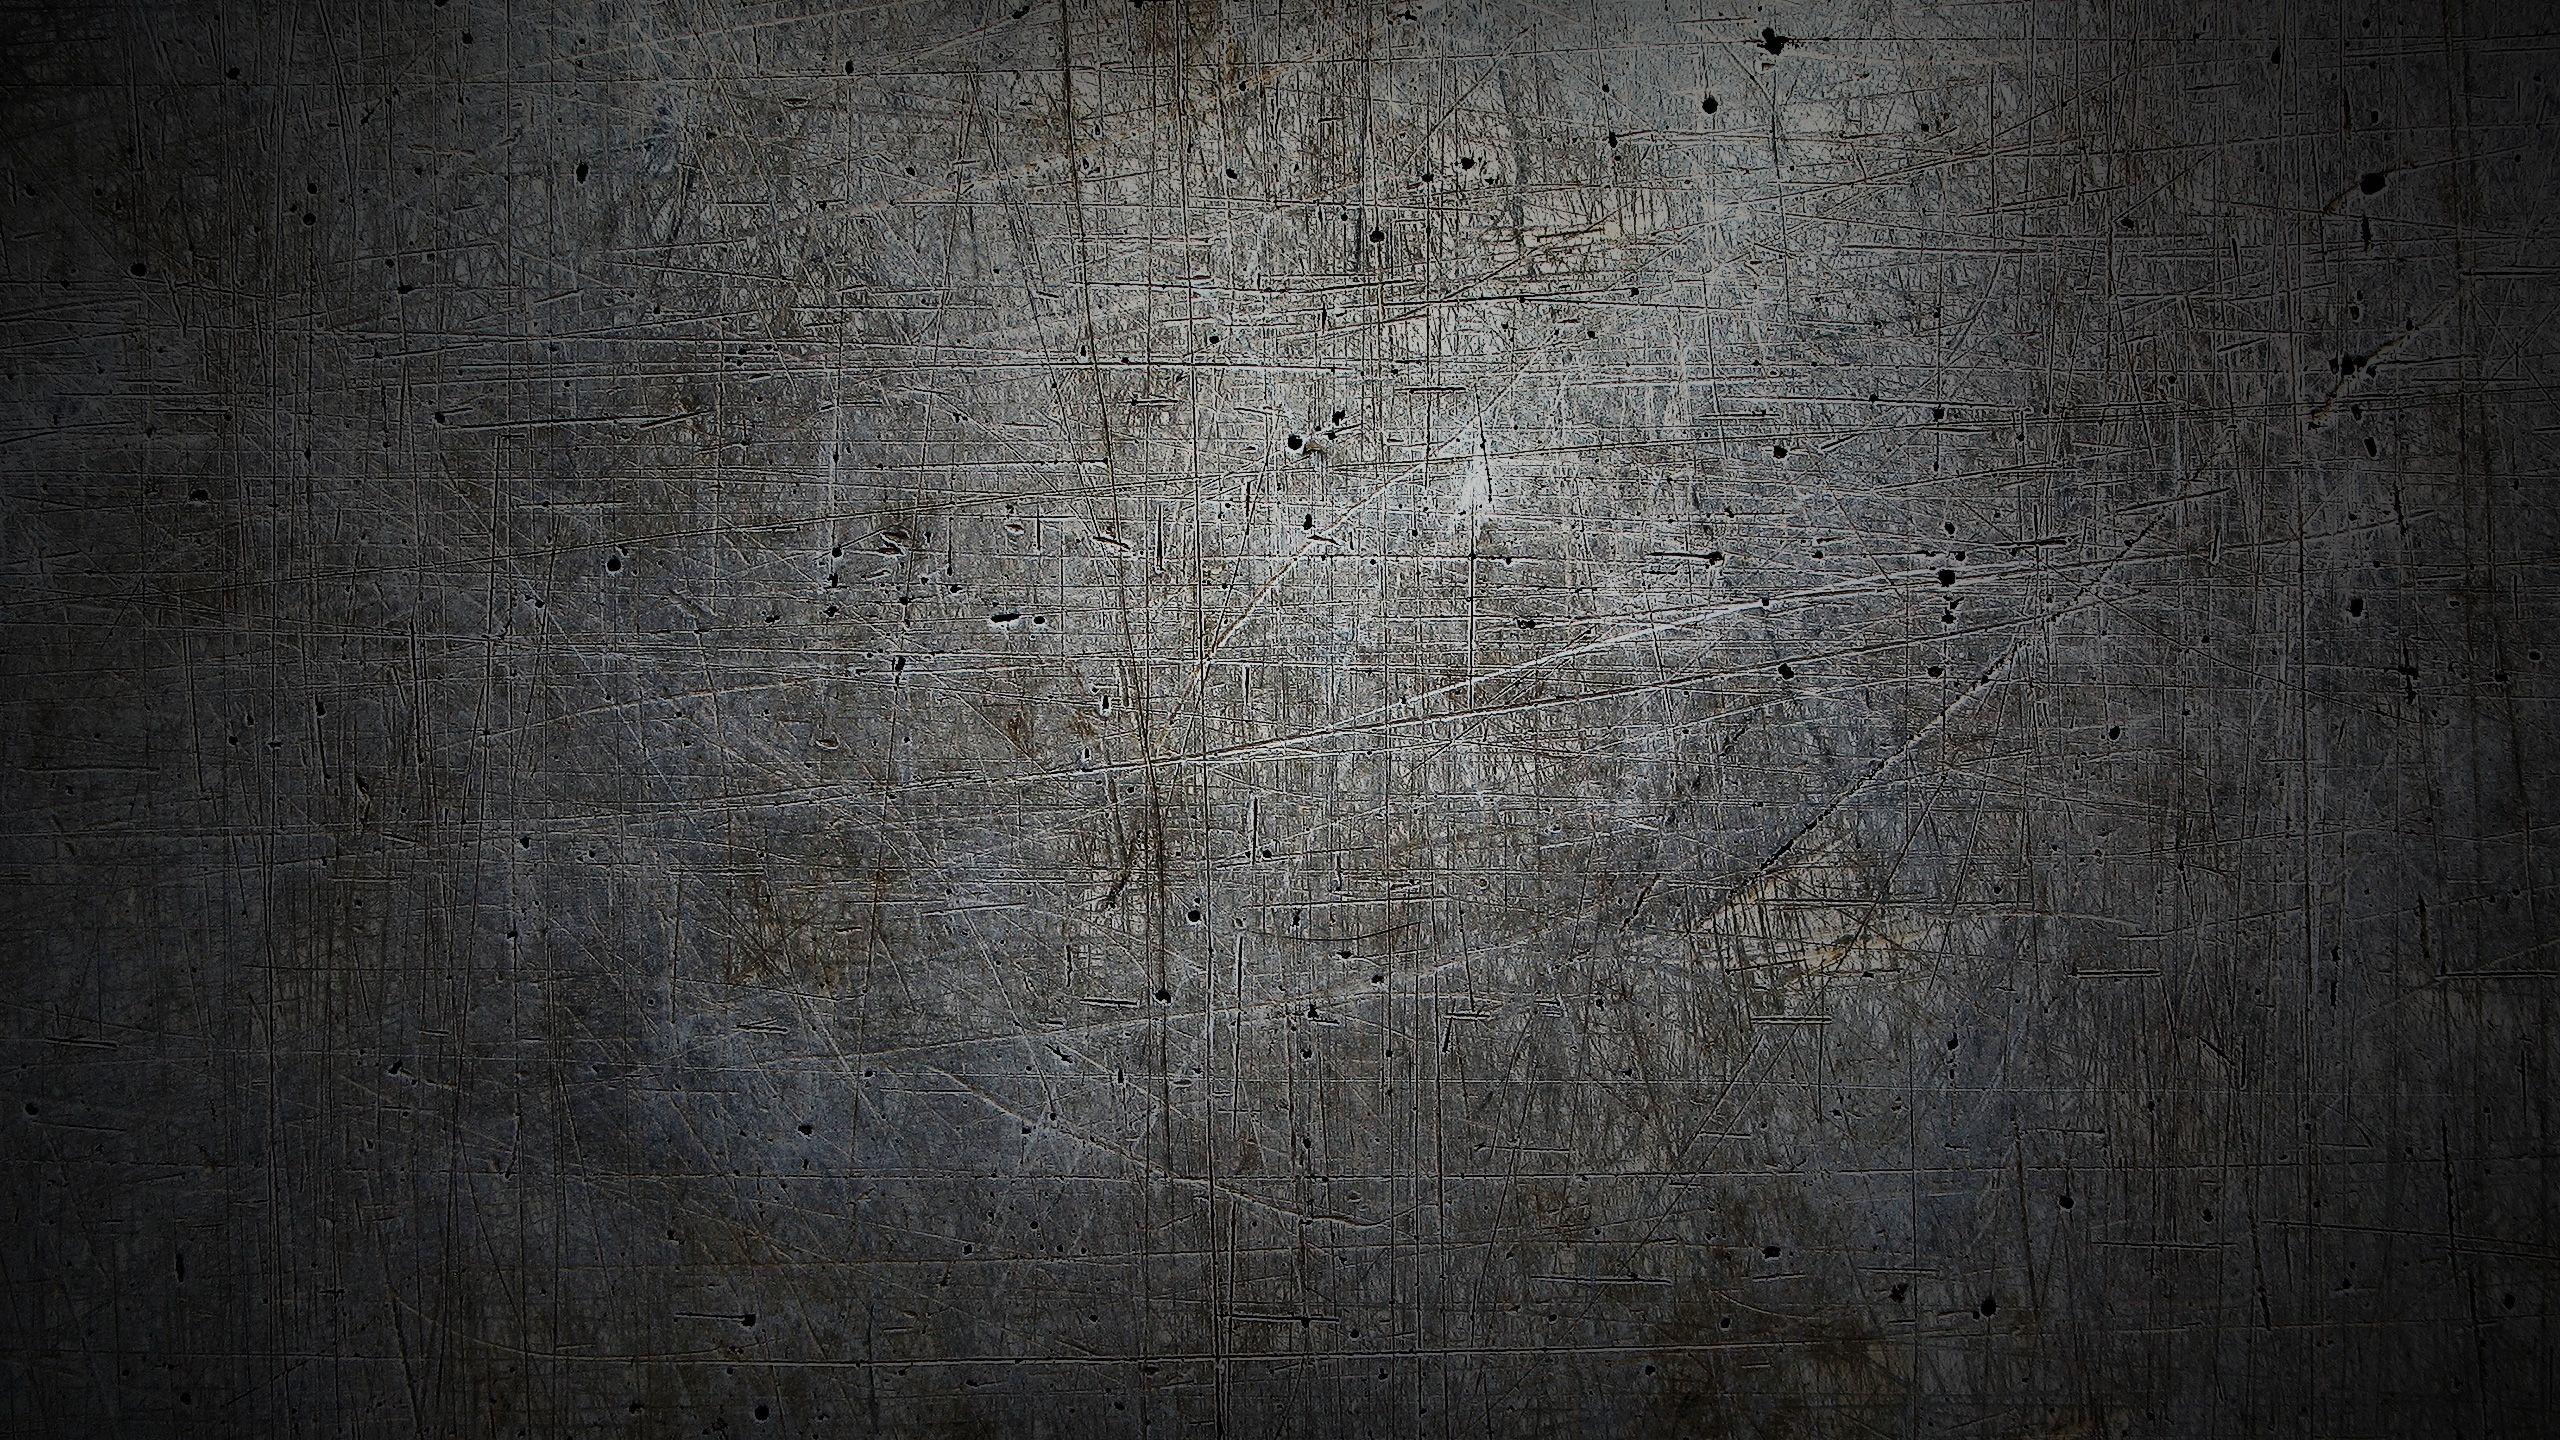 Development Scrap Metal picture nr 61173 2560x1440